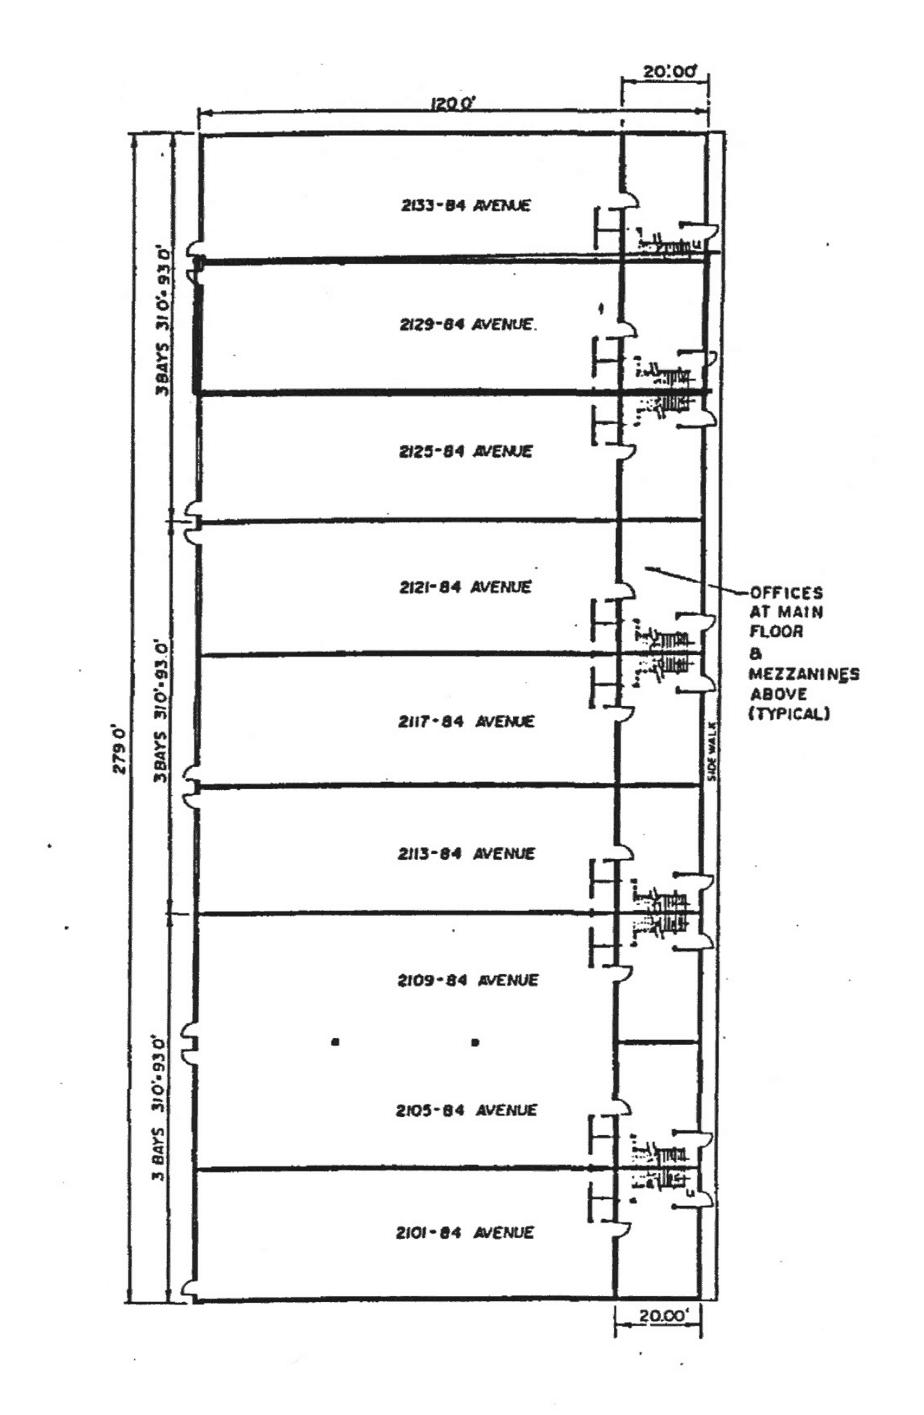 Floor Plan 84th Ave